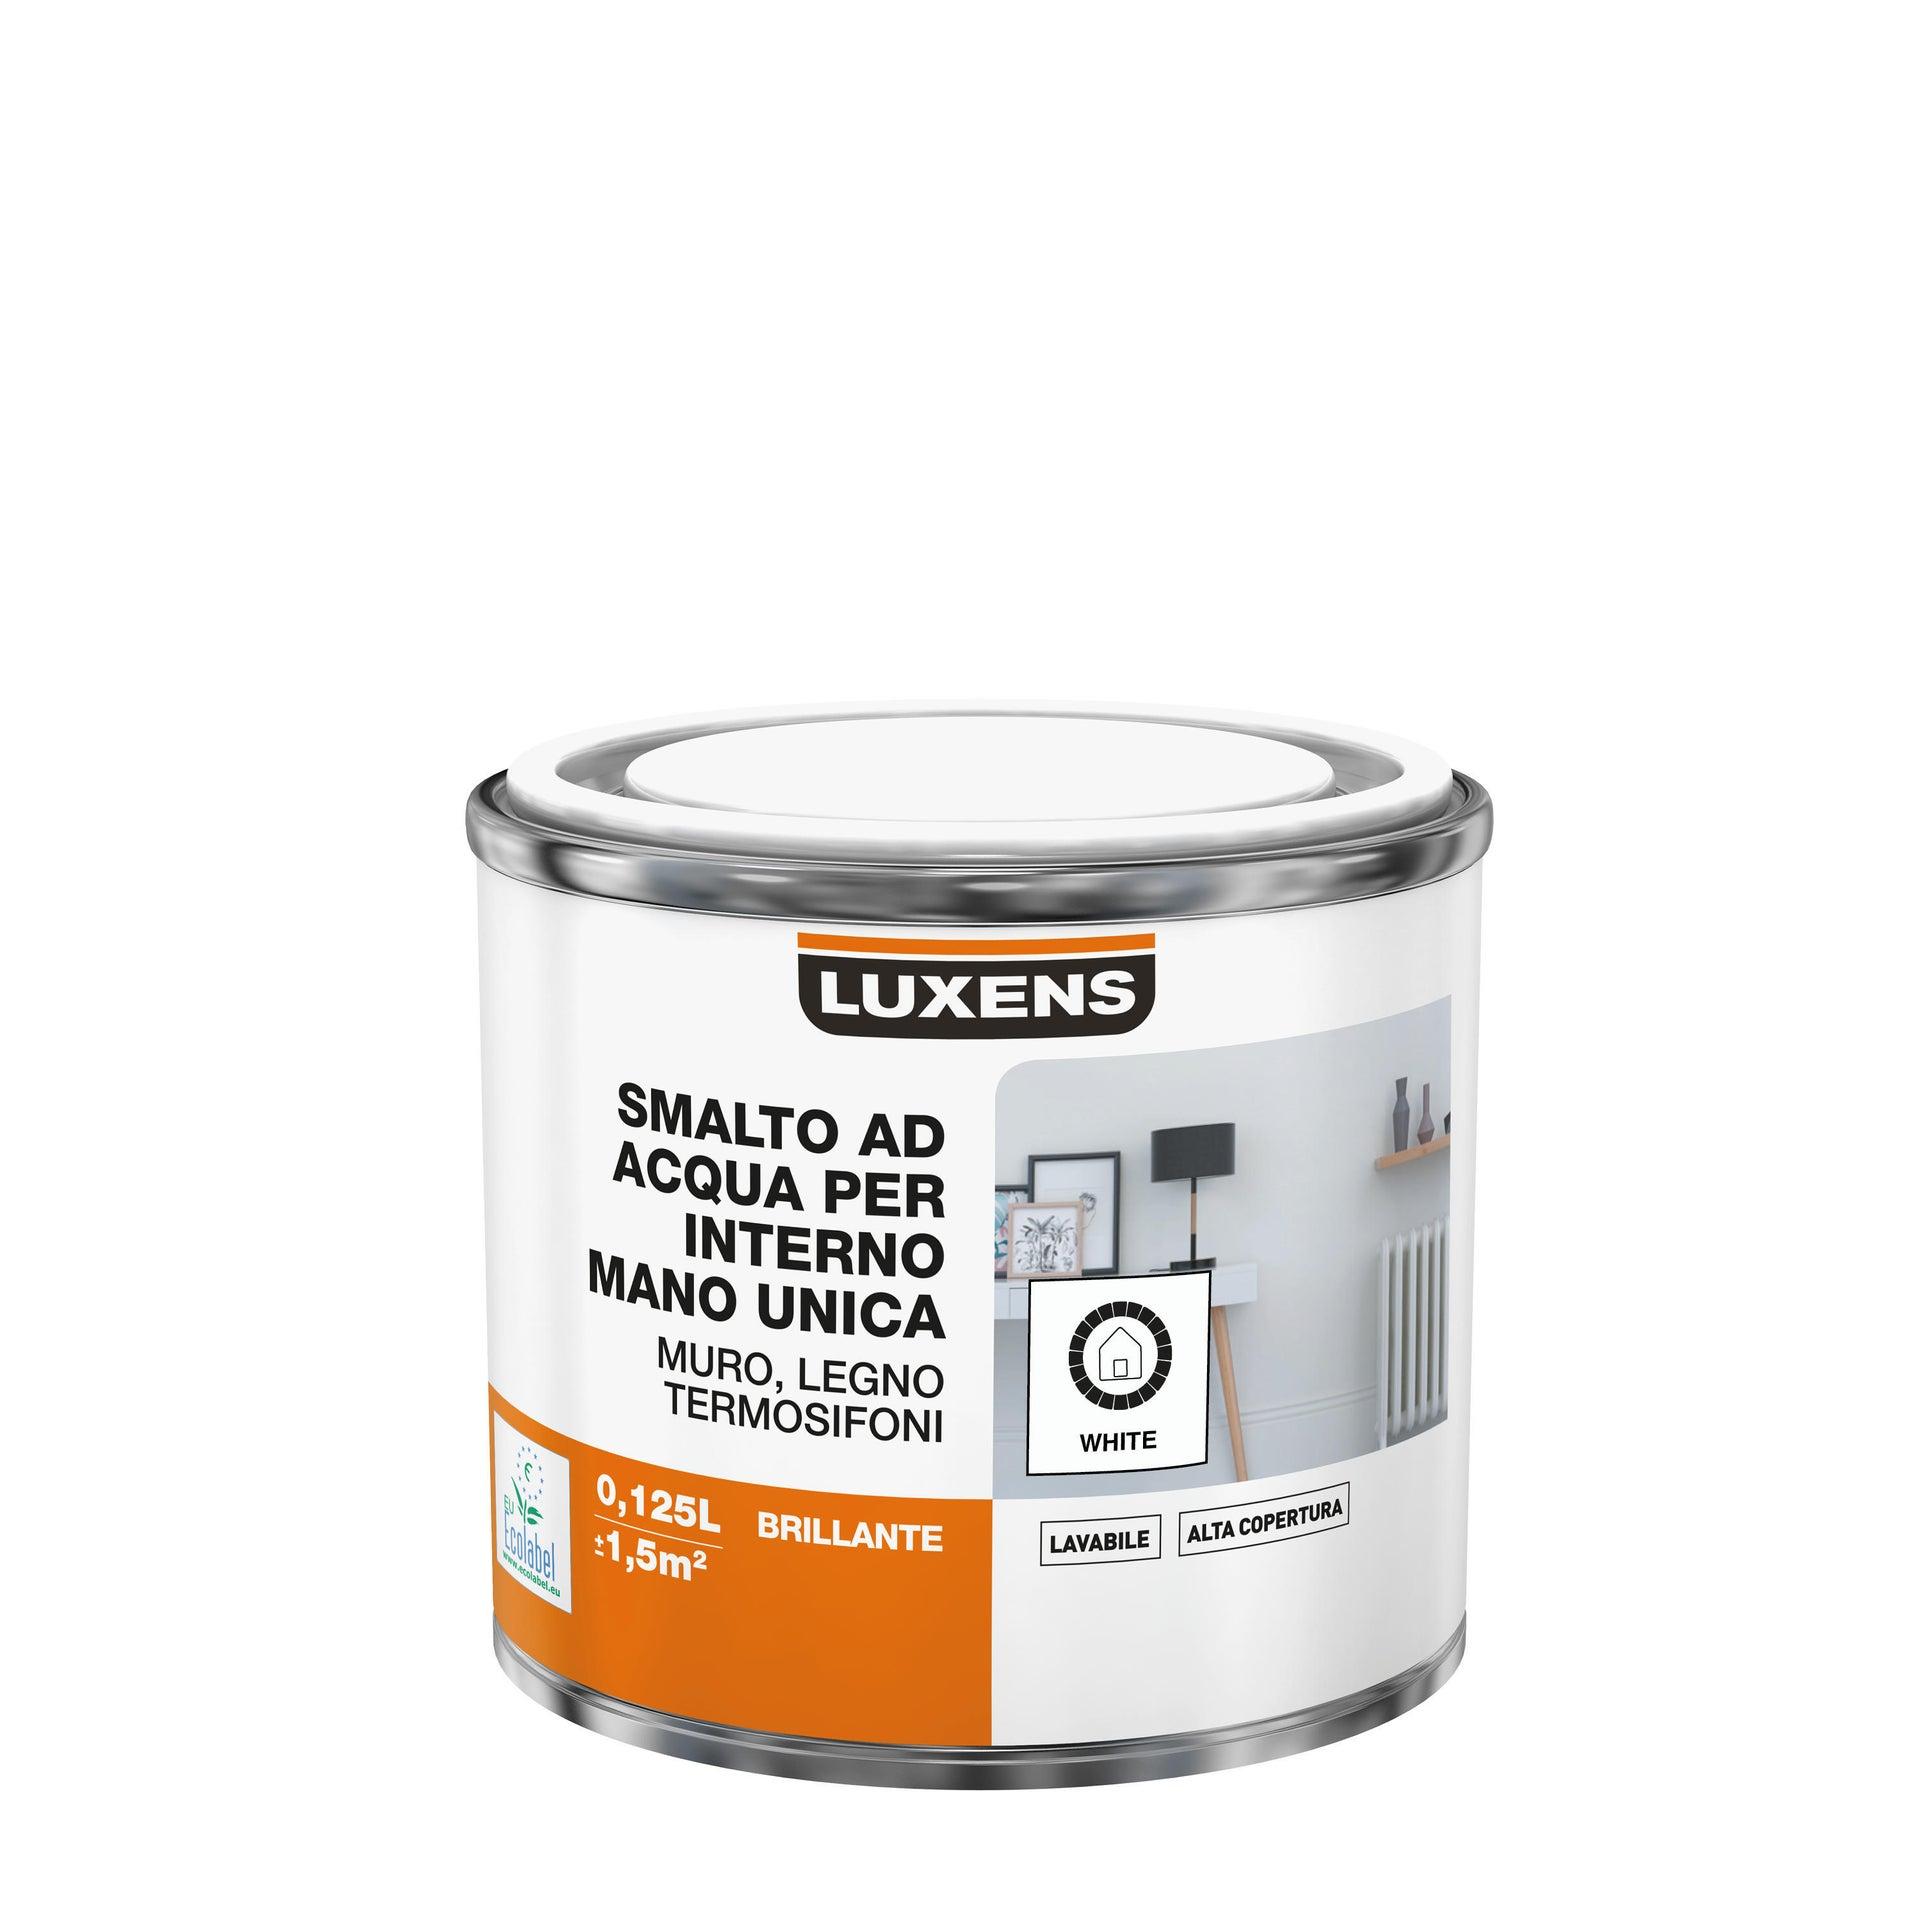 Vernice di finitura LUXENS Manounica base acqua bianco lucido 0.125 L - 4